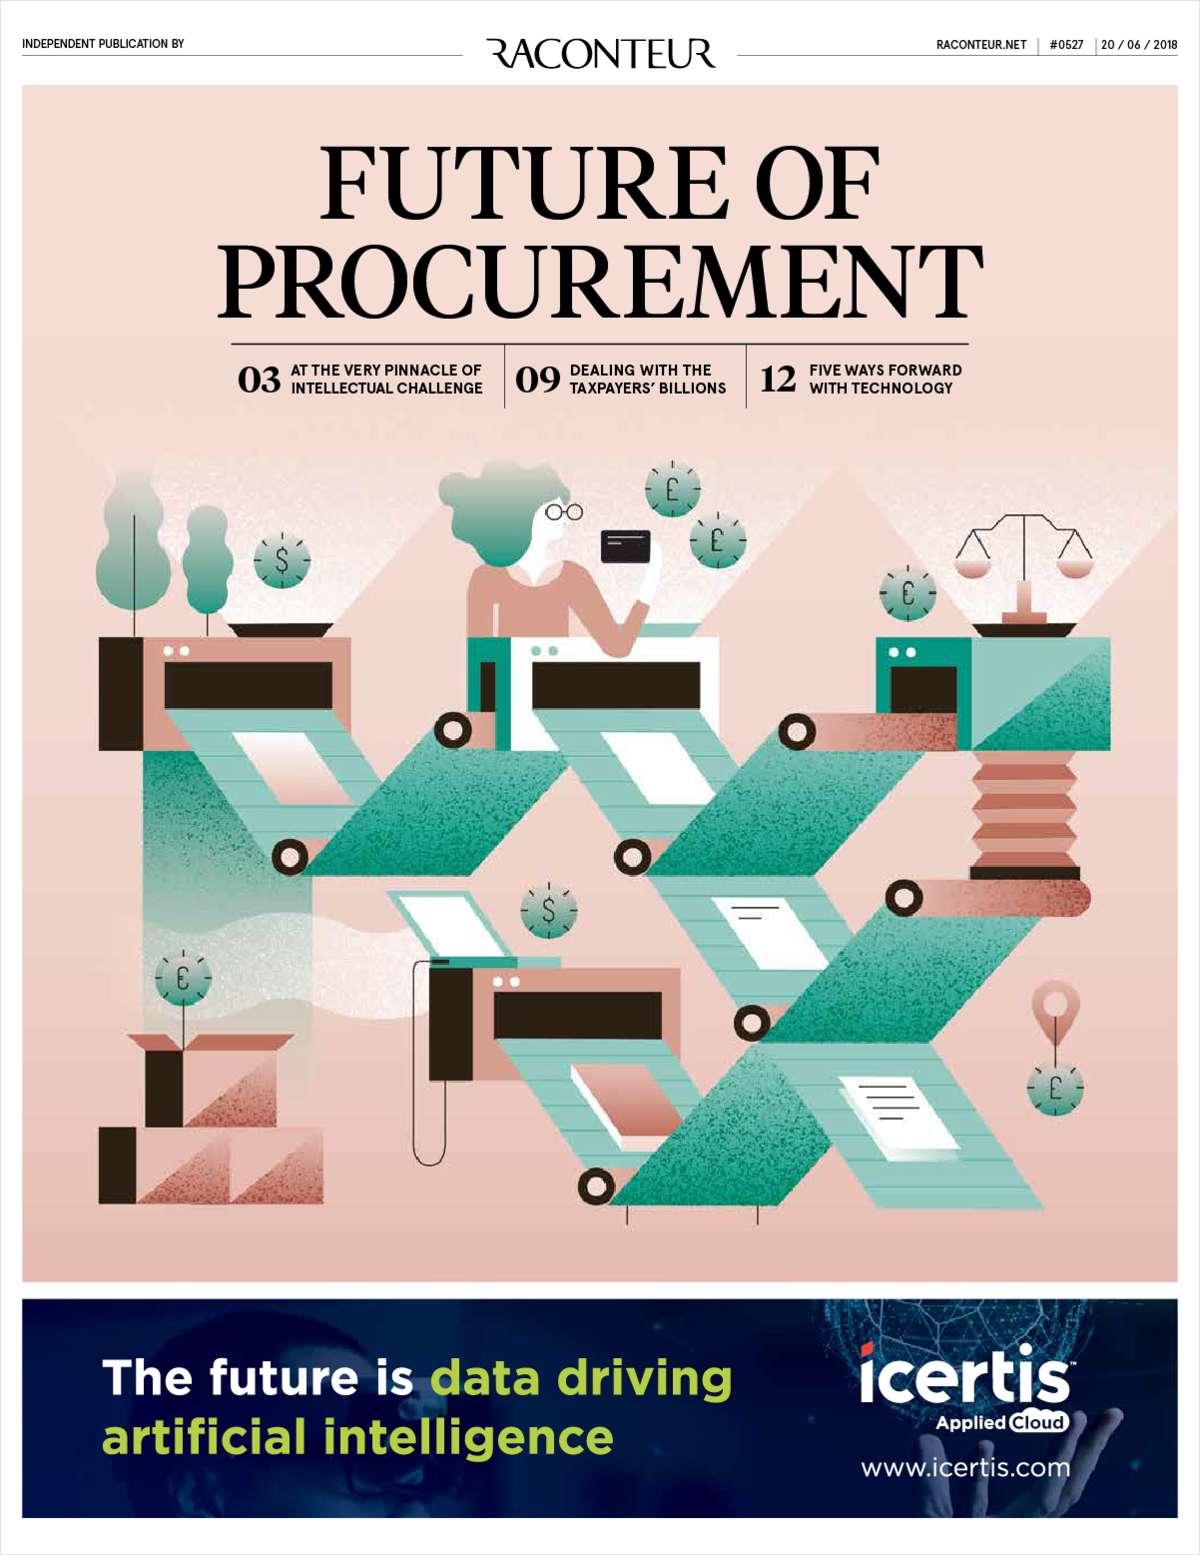 The Future of Procurement: Data Driving AI